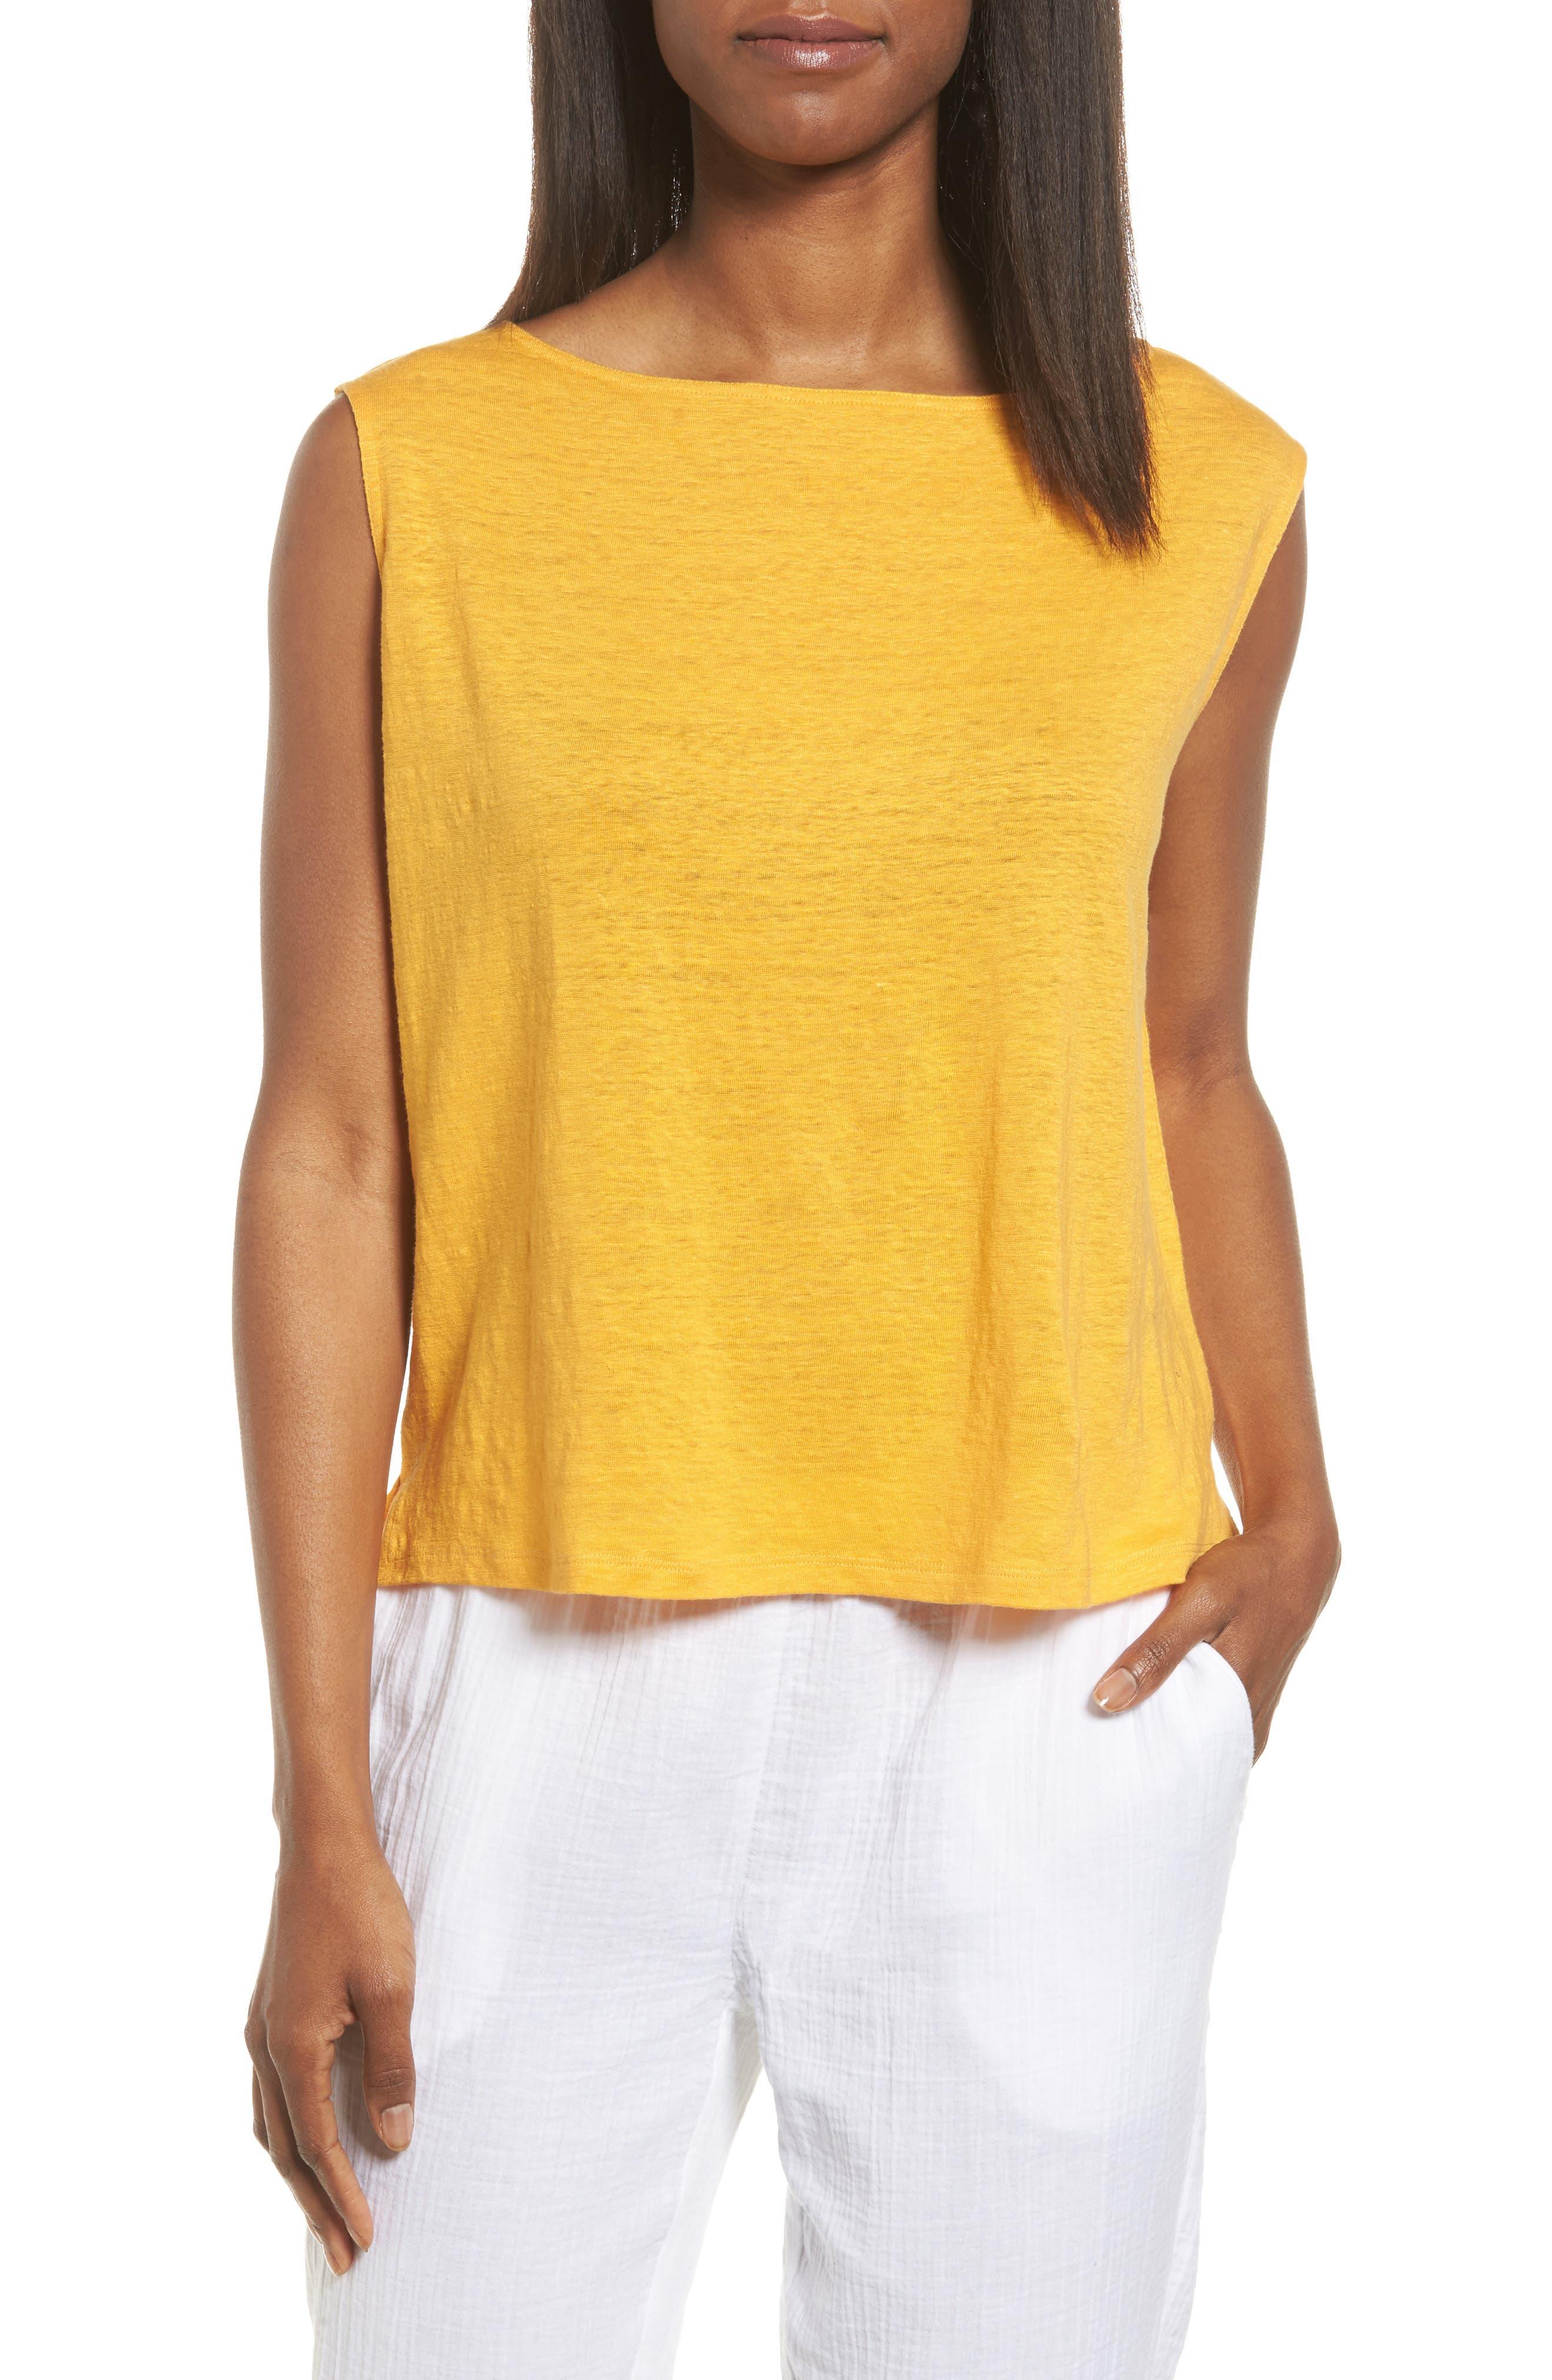 Organic Linen Top,                         Main,                         color, Orangeade